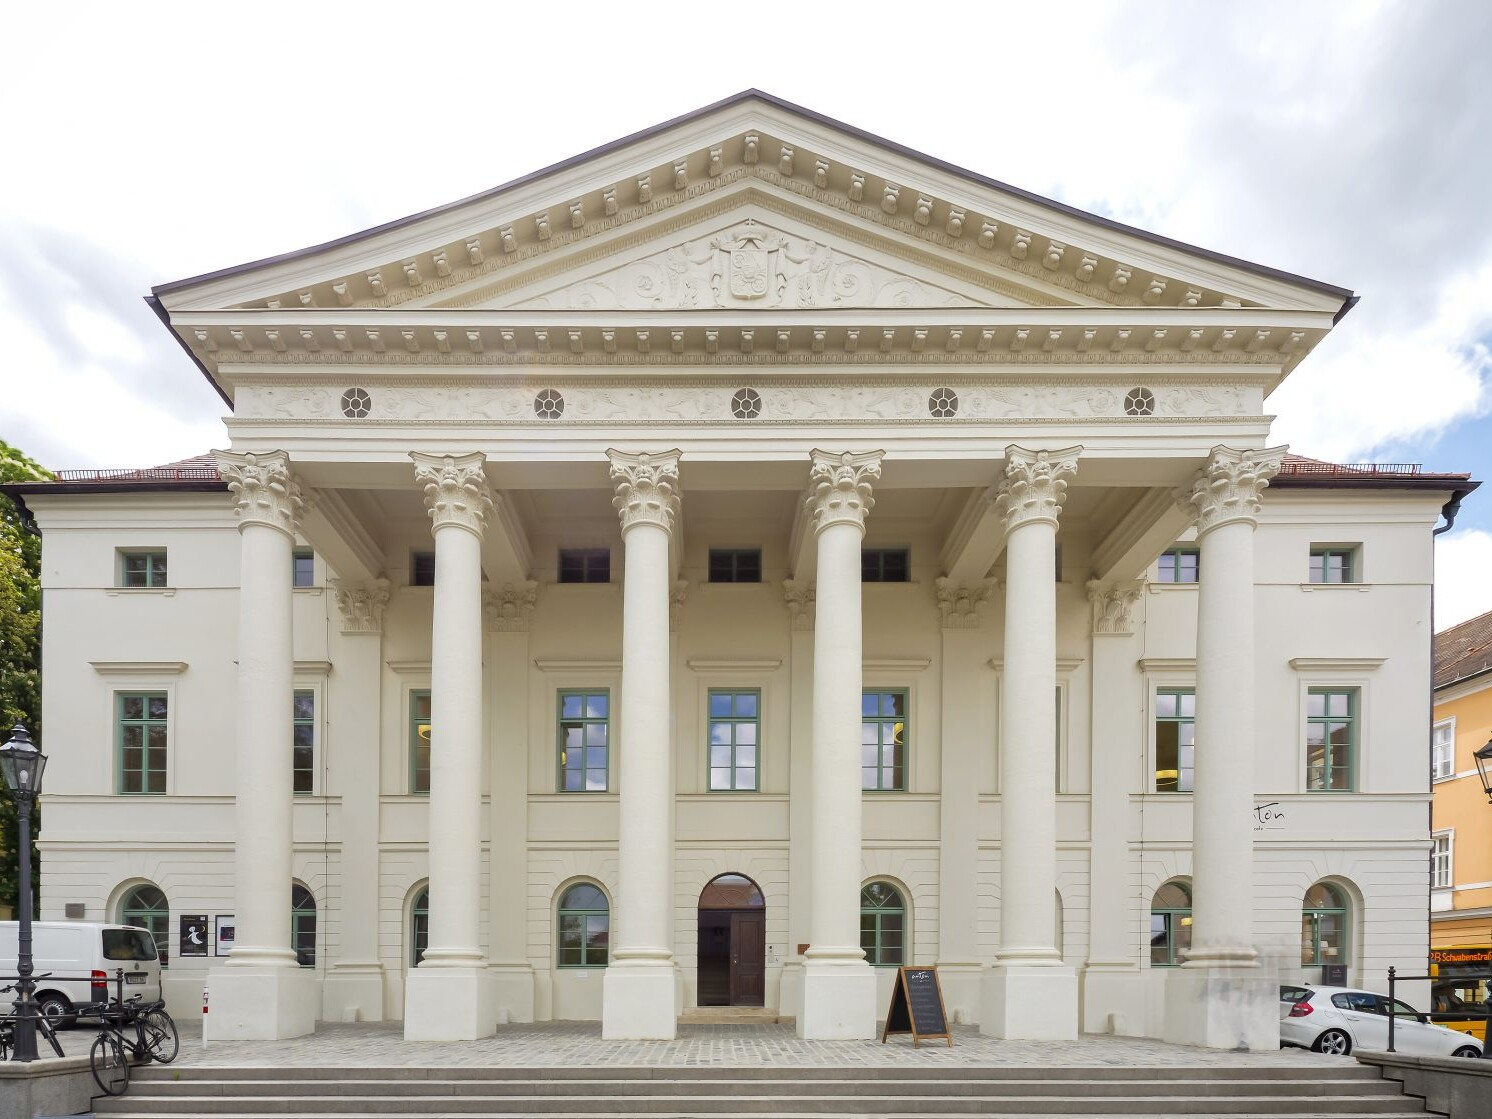 Haus der Musik, Regensburg